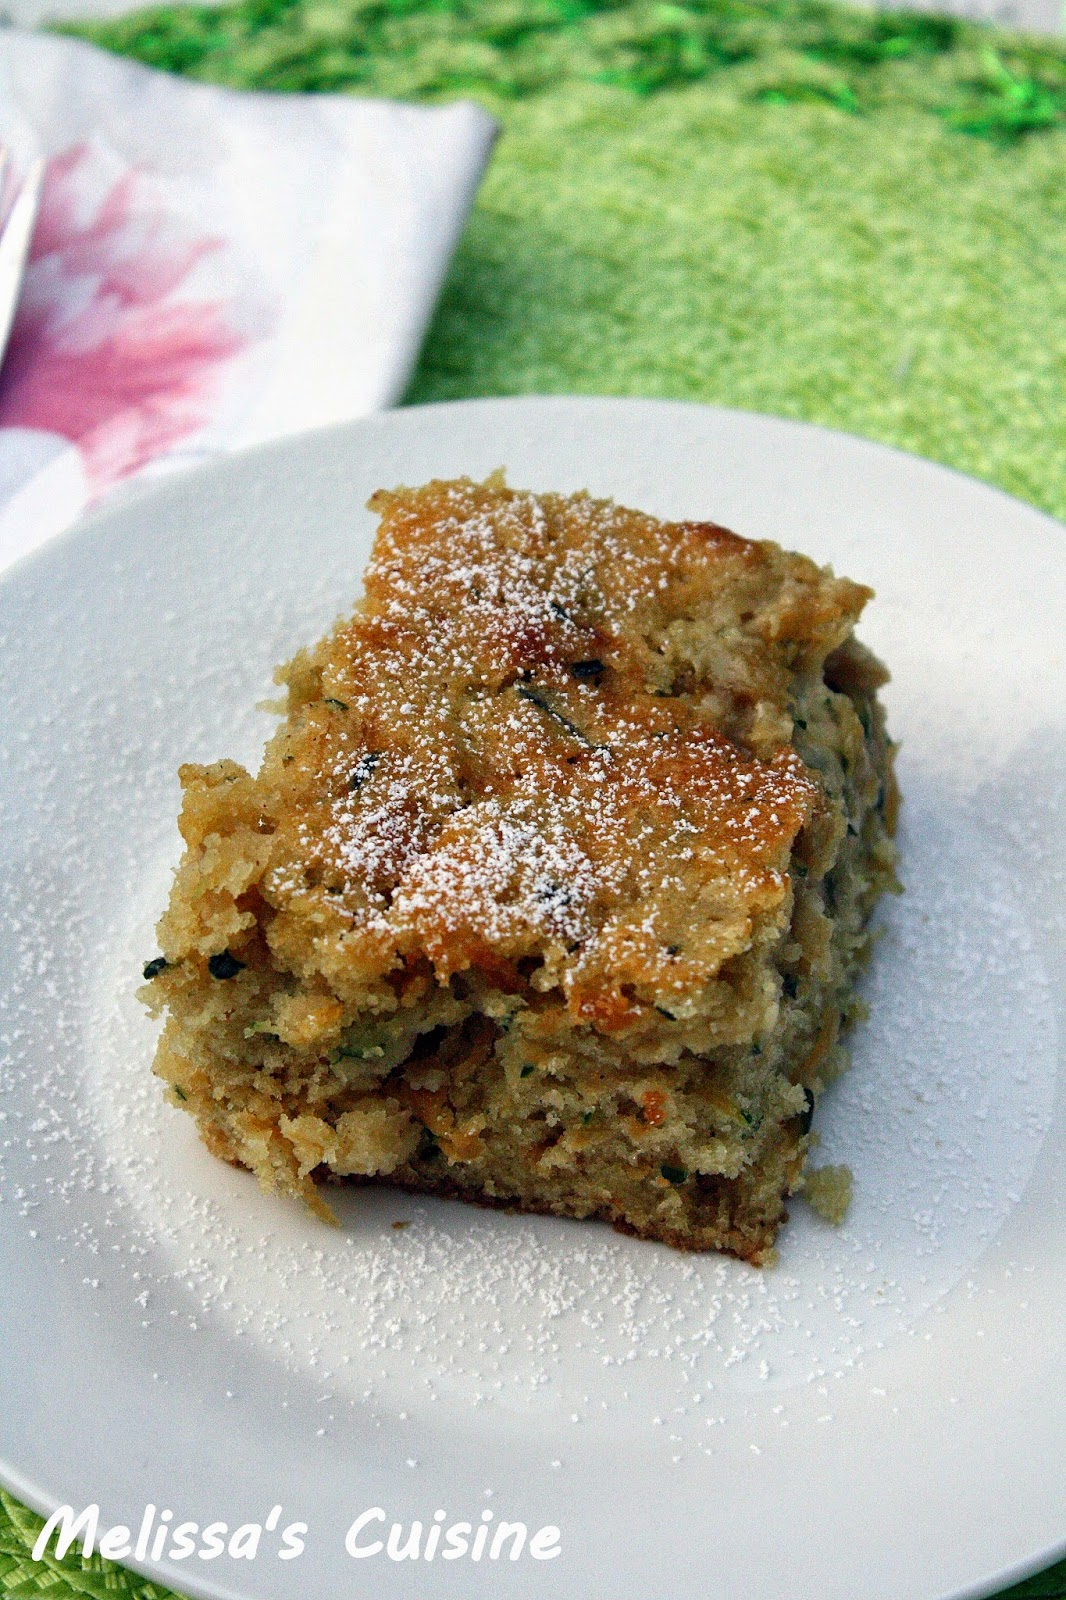 Melissa's Cuisine: Zucchini Cake